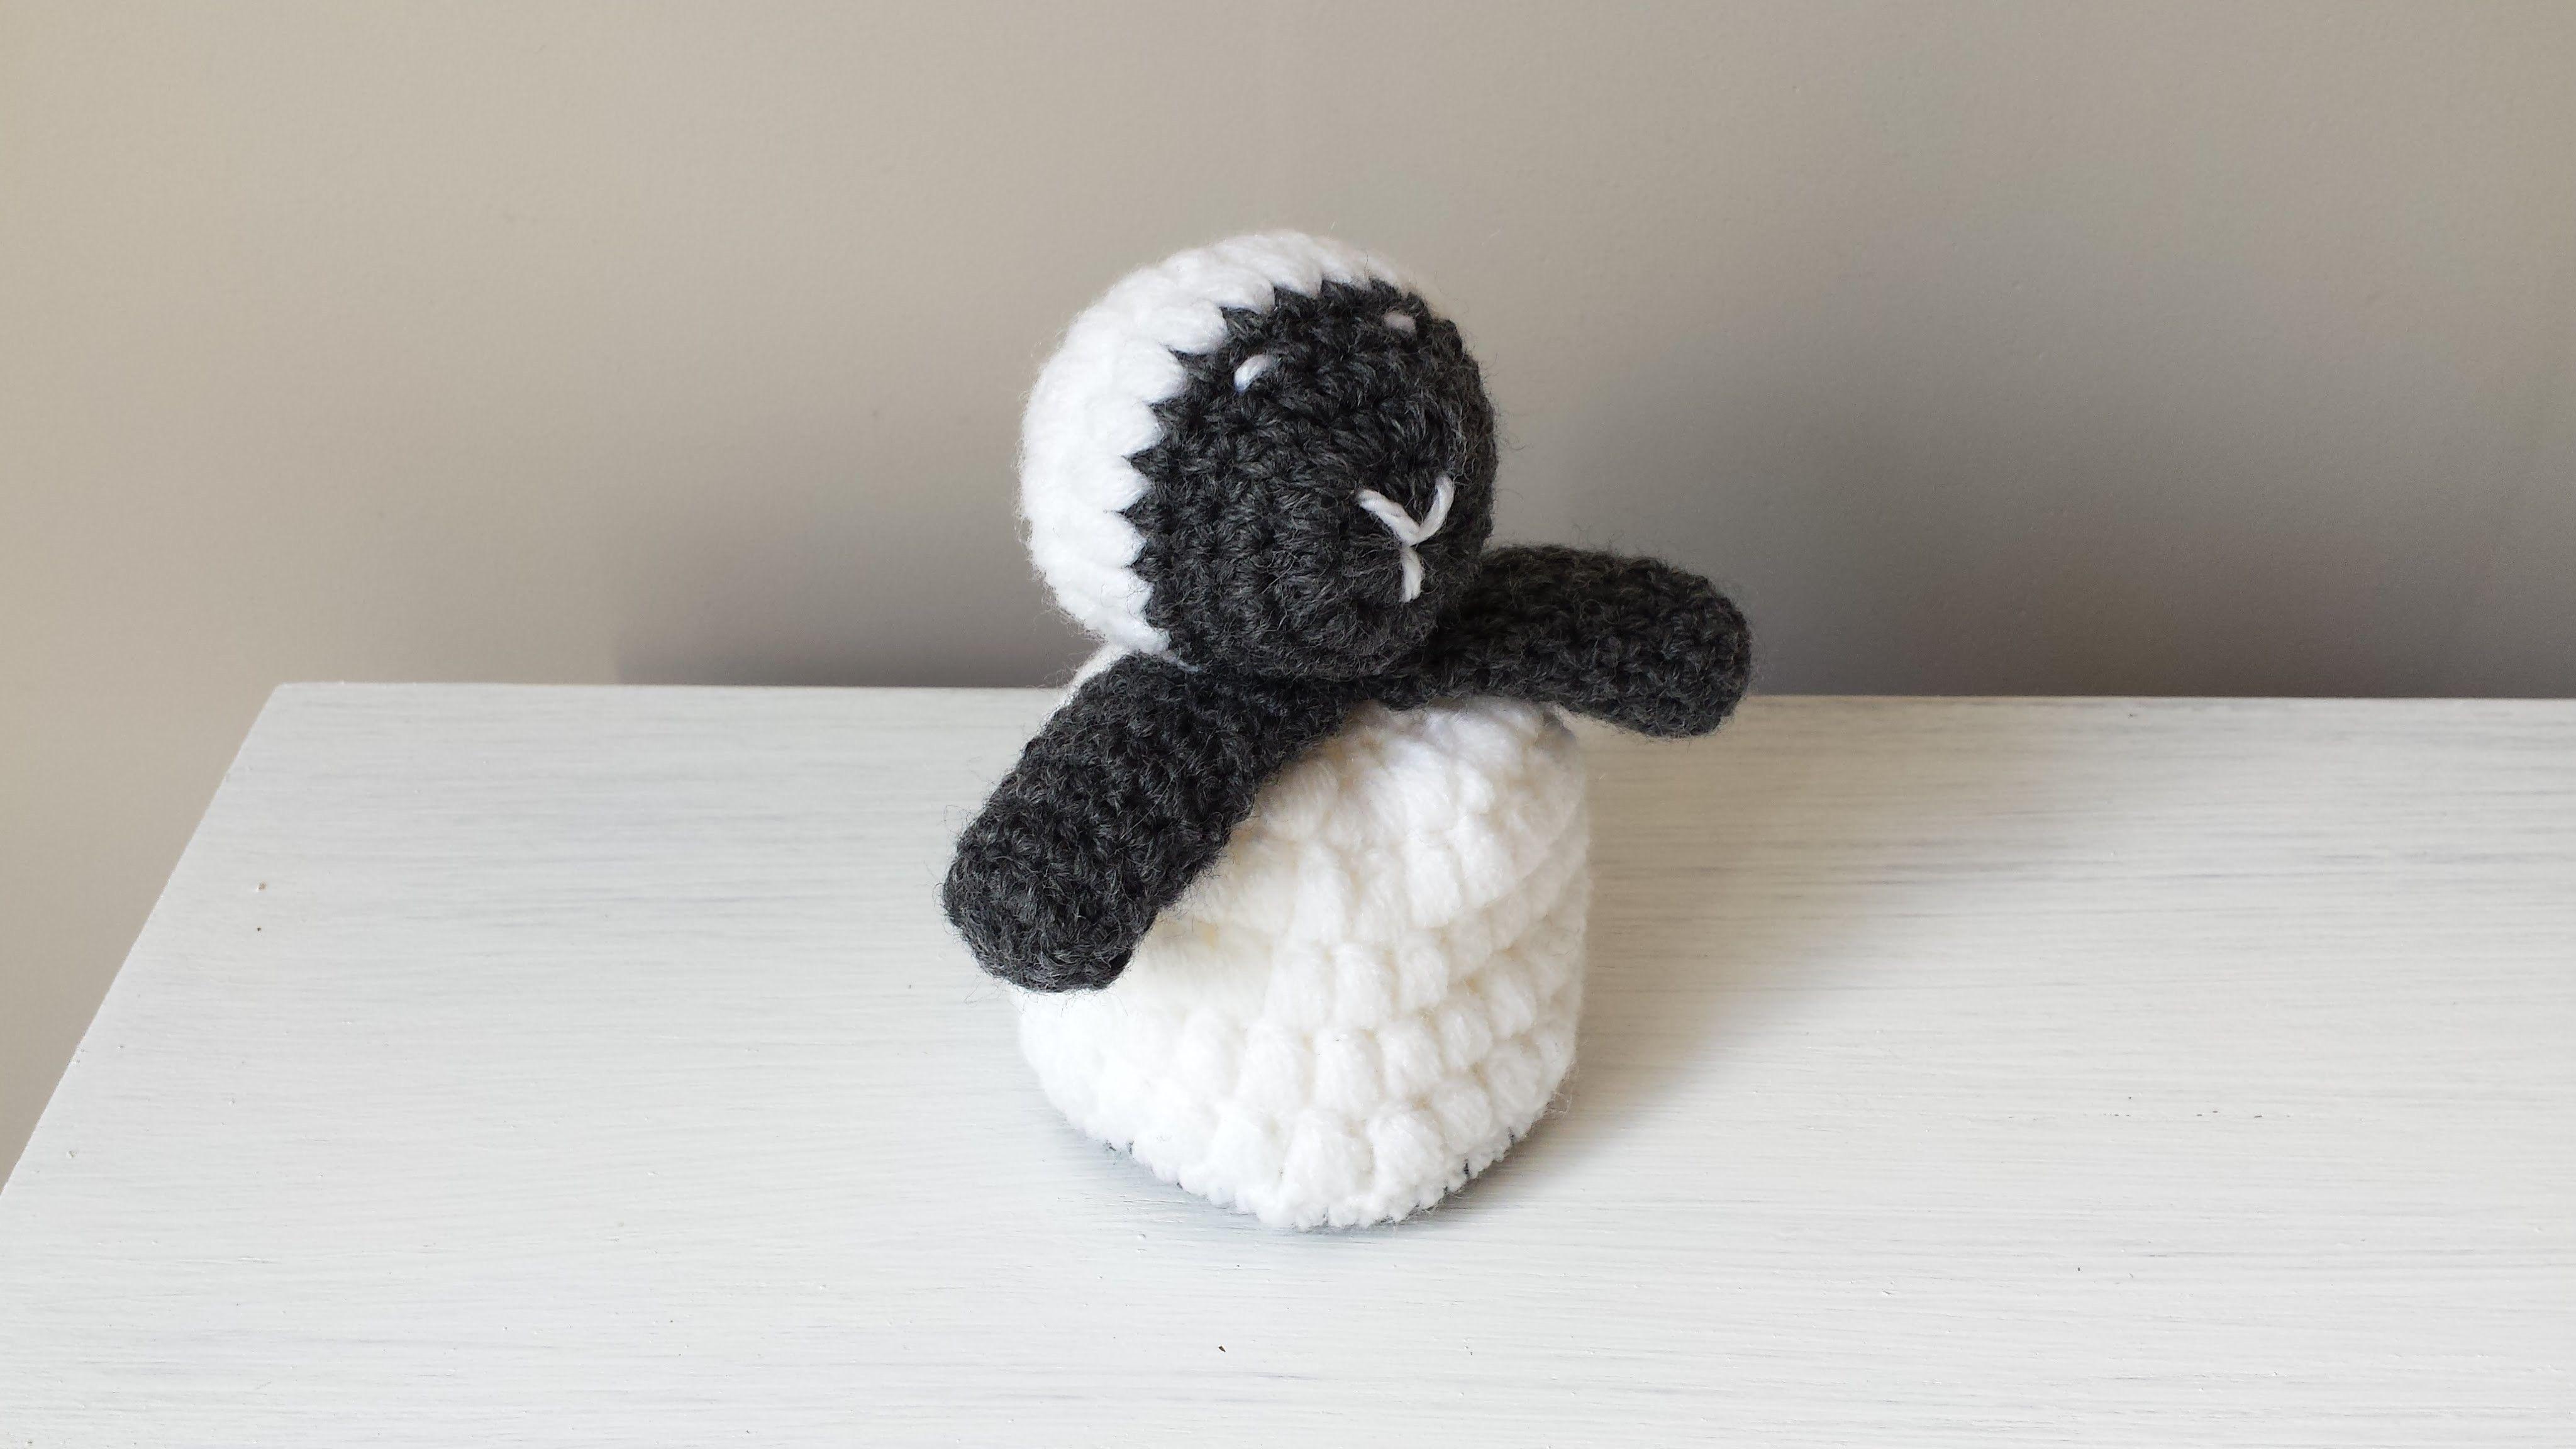 Amigurumi Tutorial Animali : Maskotki na szydełku po polsku owca amigurumi amigurumi